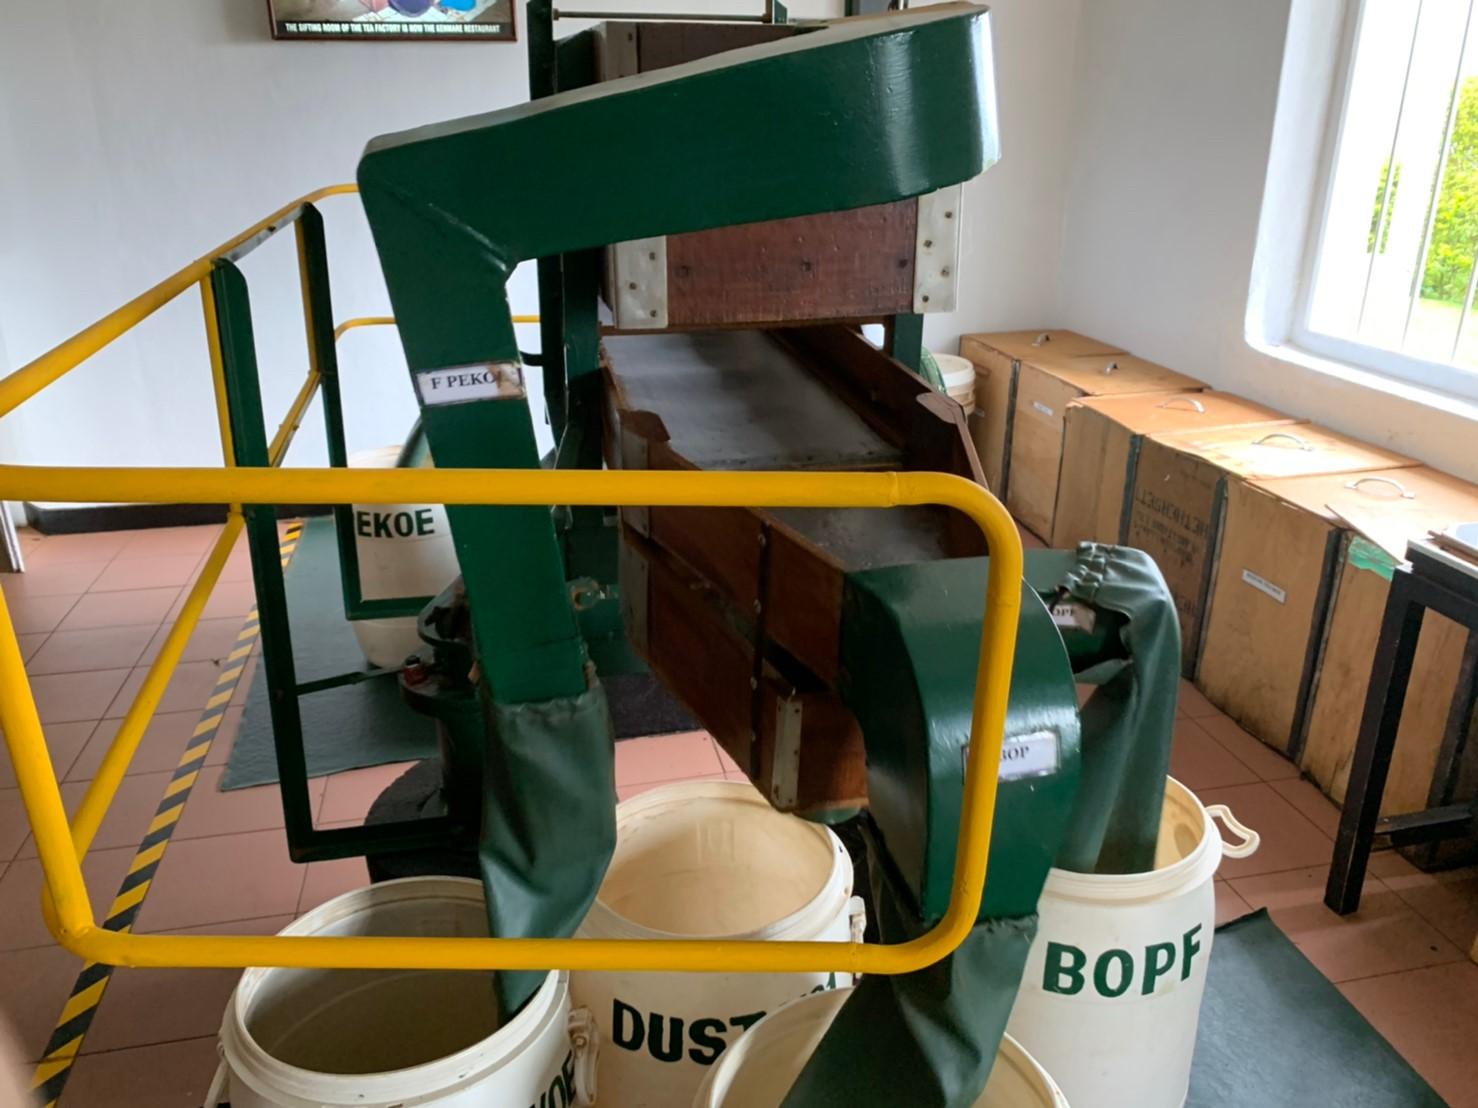 紅茶の製造工程